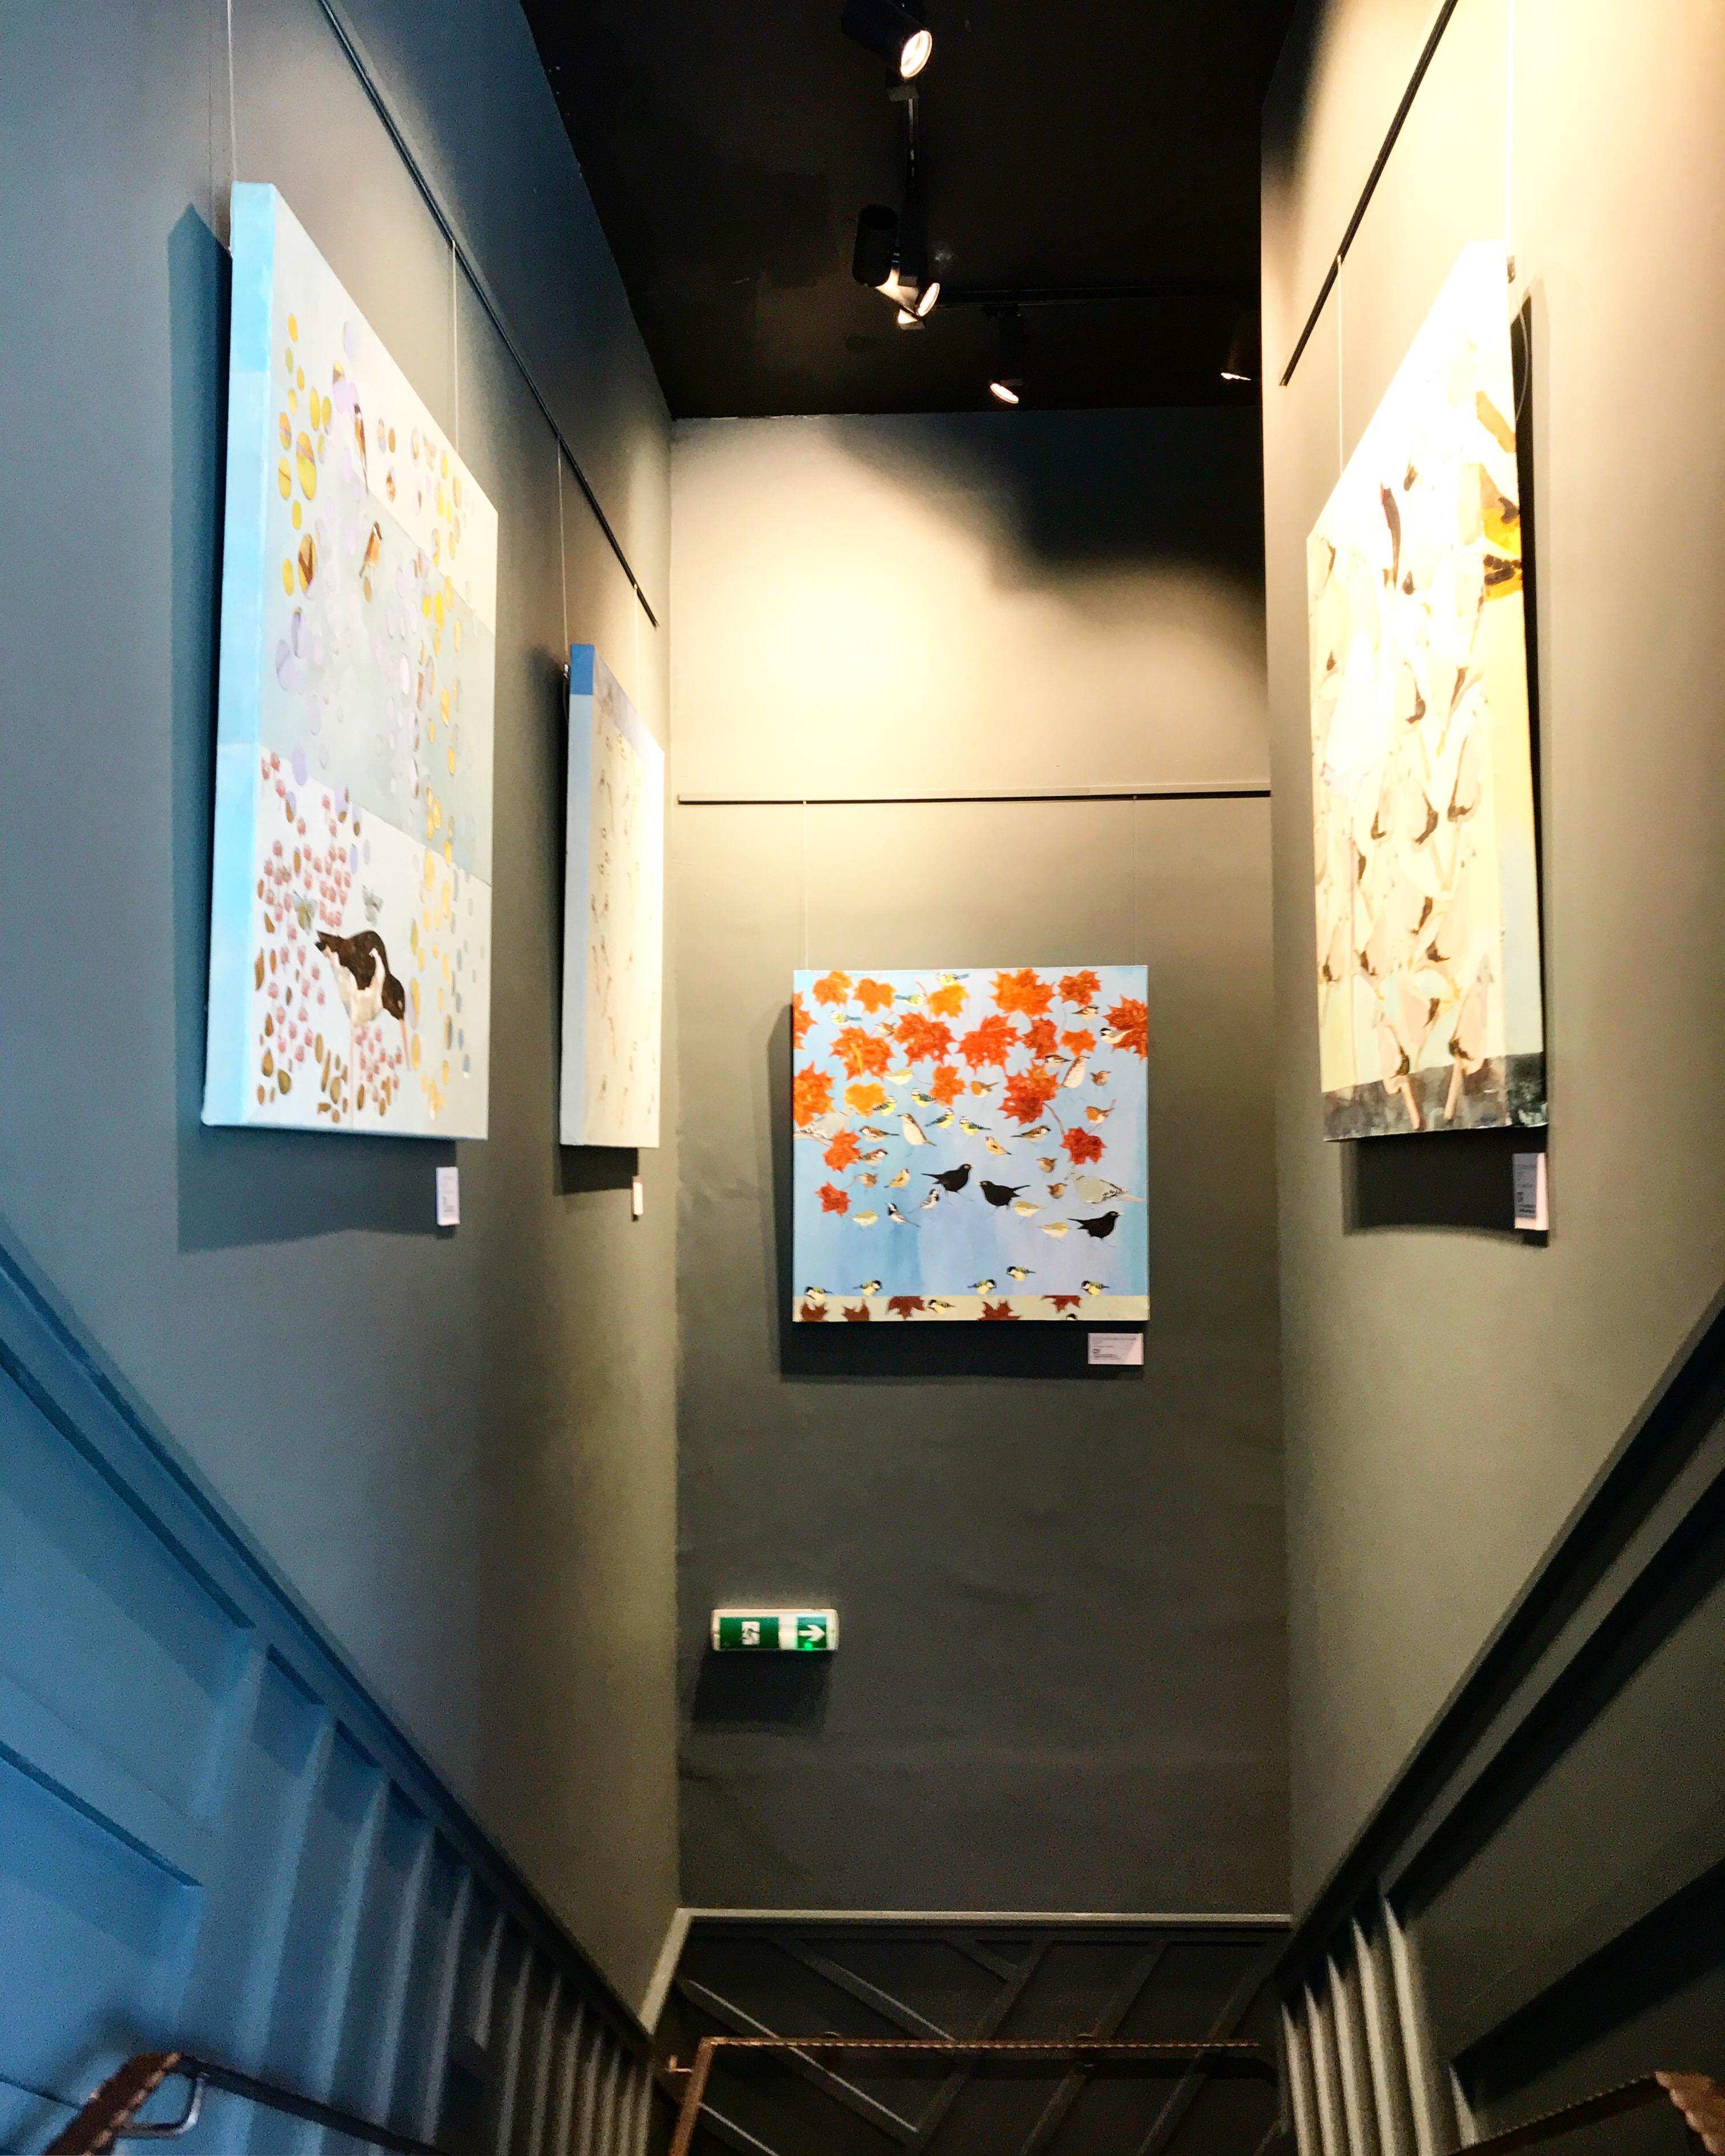 CHRISTOPHER RAINHAM - Exhibition View